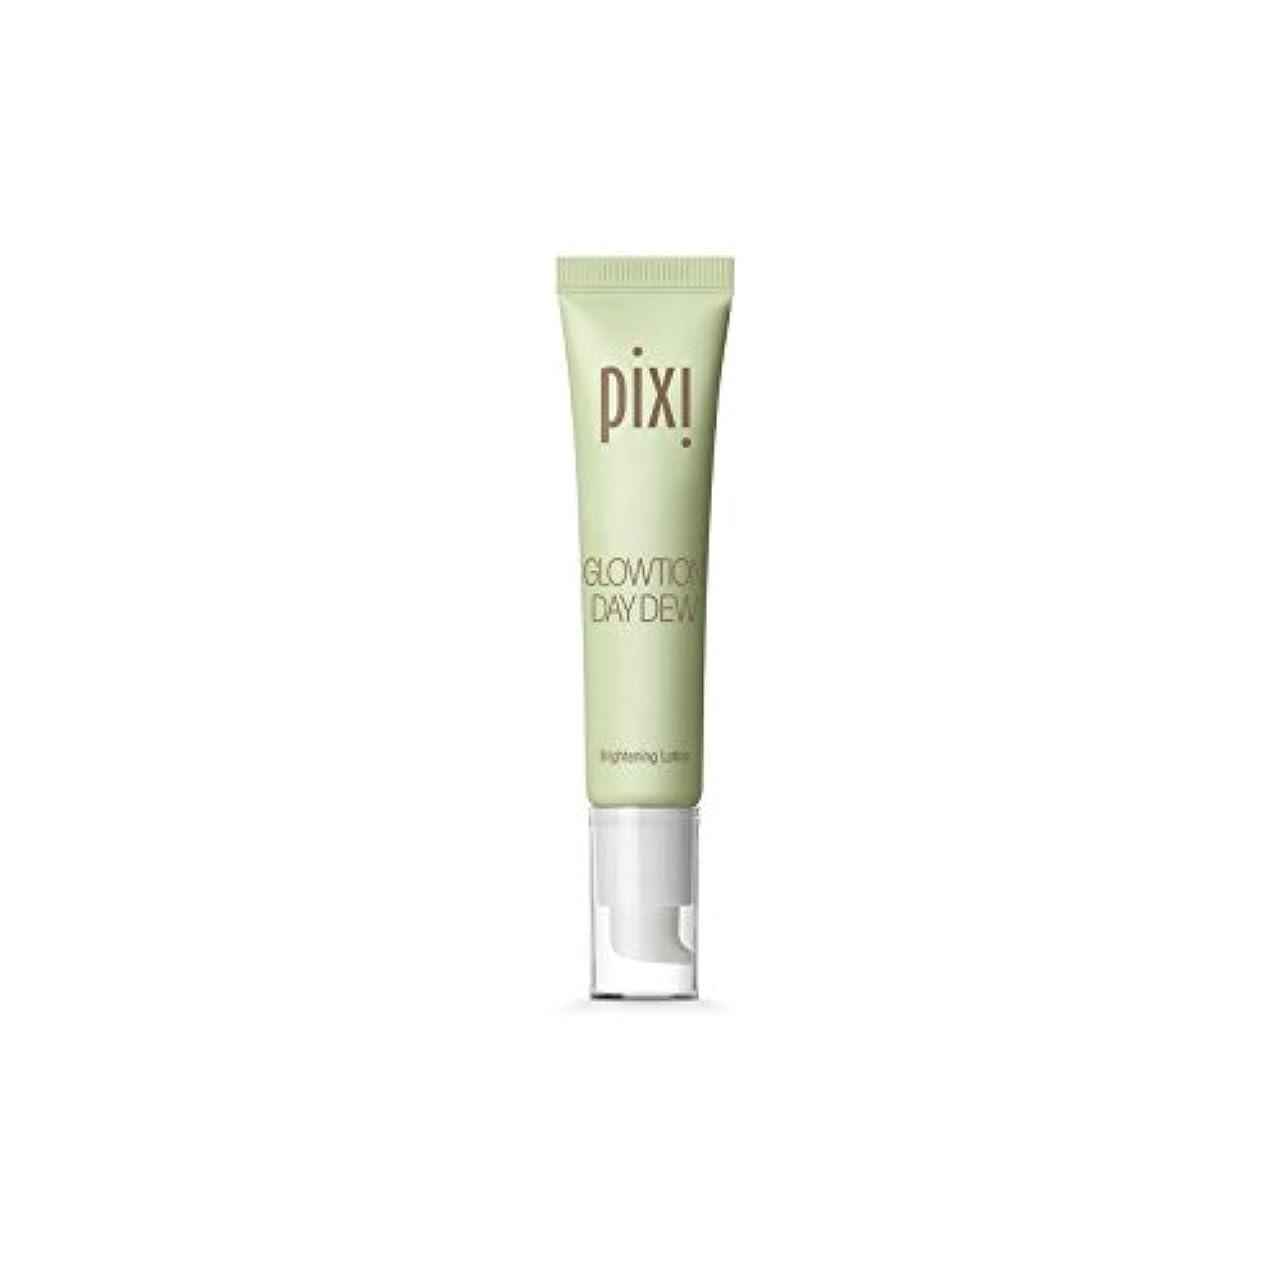 測定可能リレー領域日露 x2 - Pixi Pixi Glowtion Day Dew (Pack of 2) [並行輸入品]